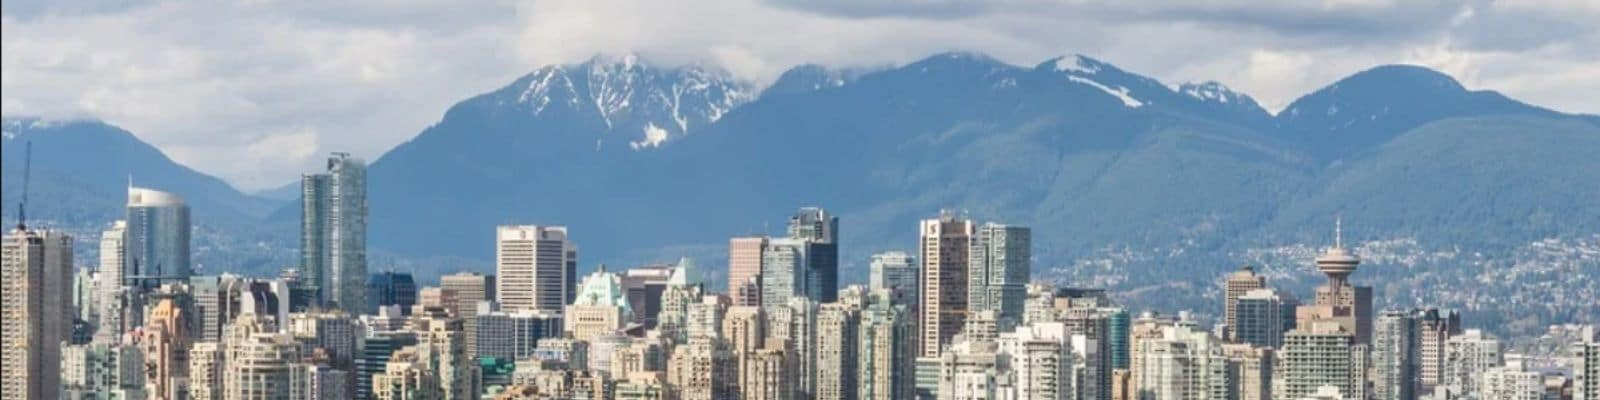 digital-marketing-courses-in-Vancouver.jpg